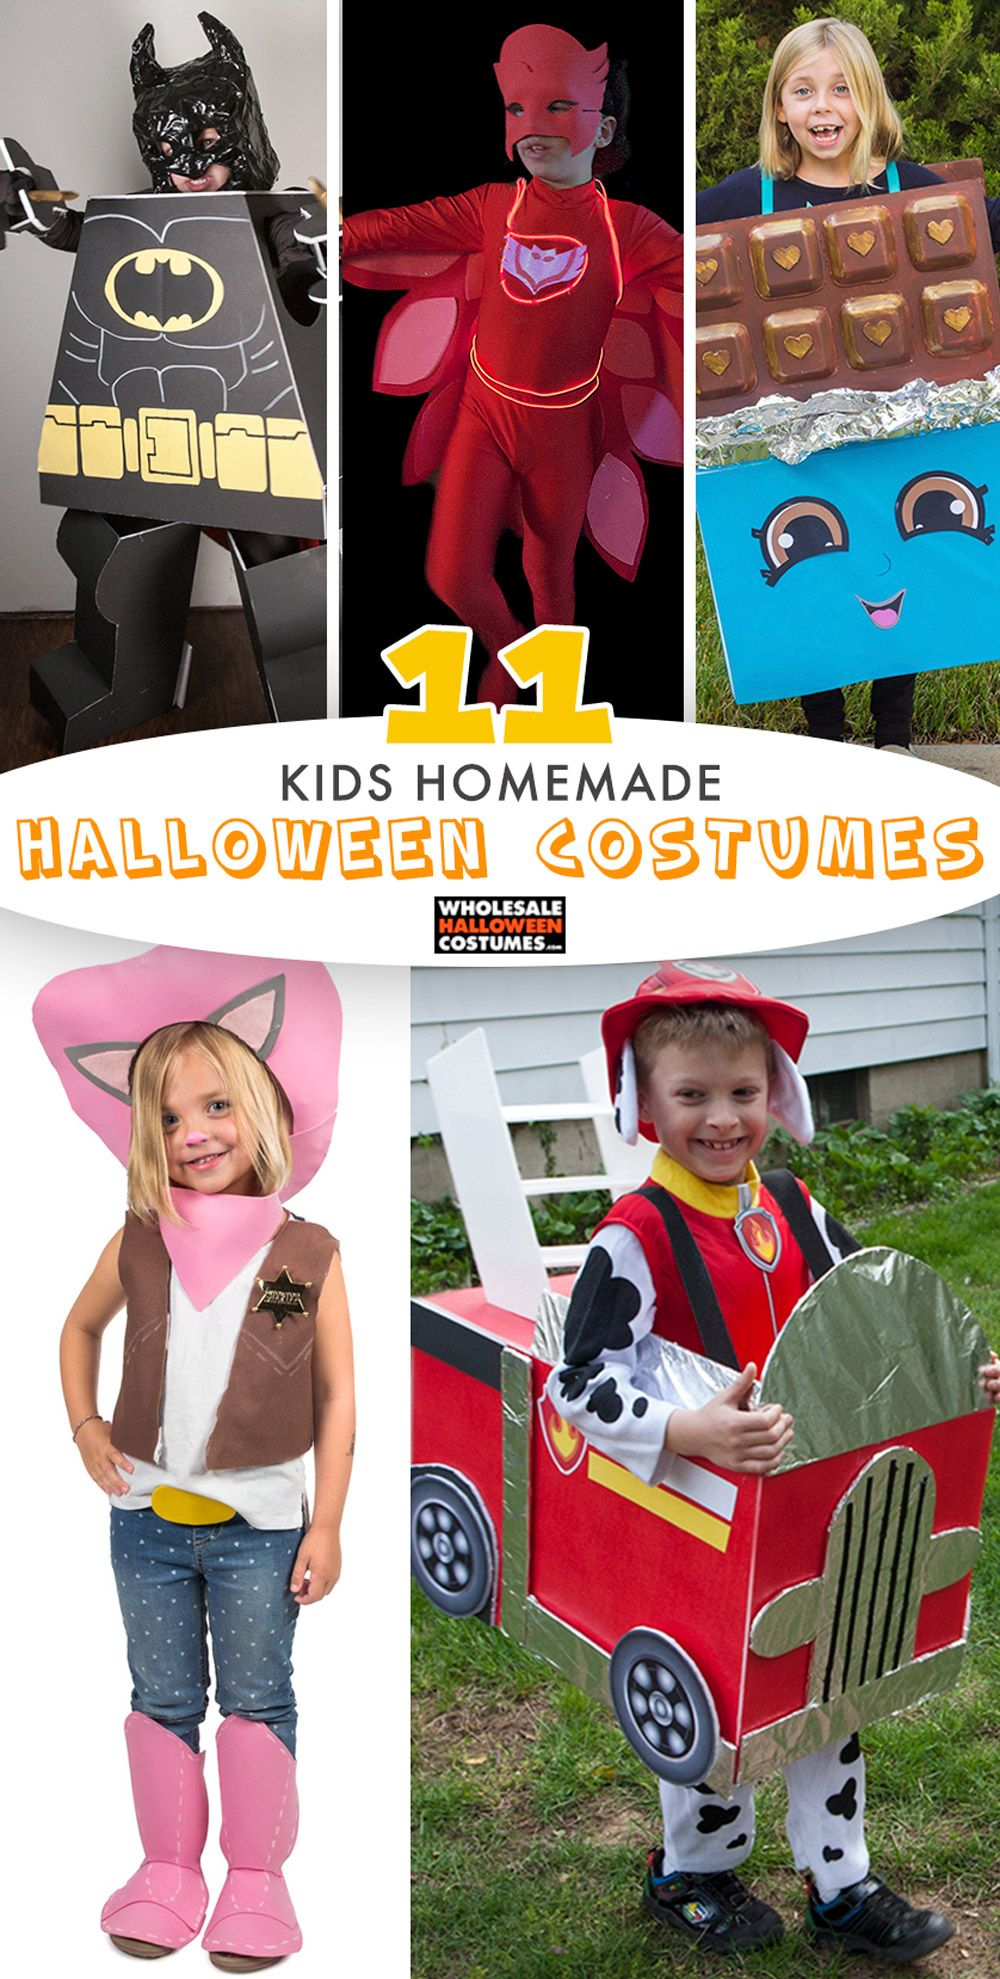 fdef4db7ece 11 DIY Halloween Costumes for Kids   DIY Halloween Costume Ideas ...